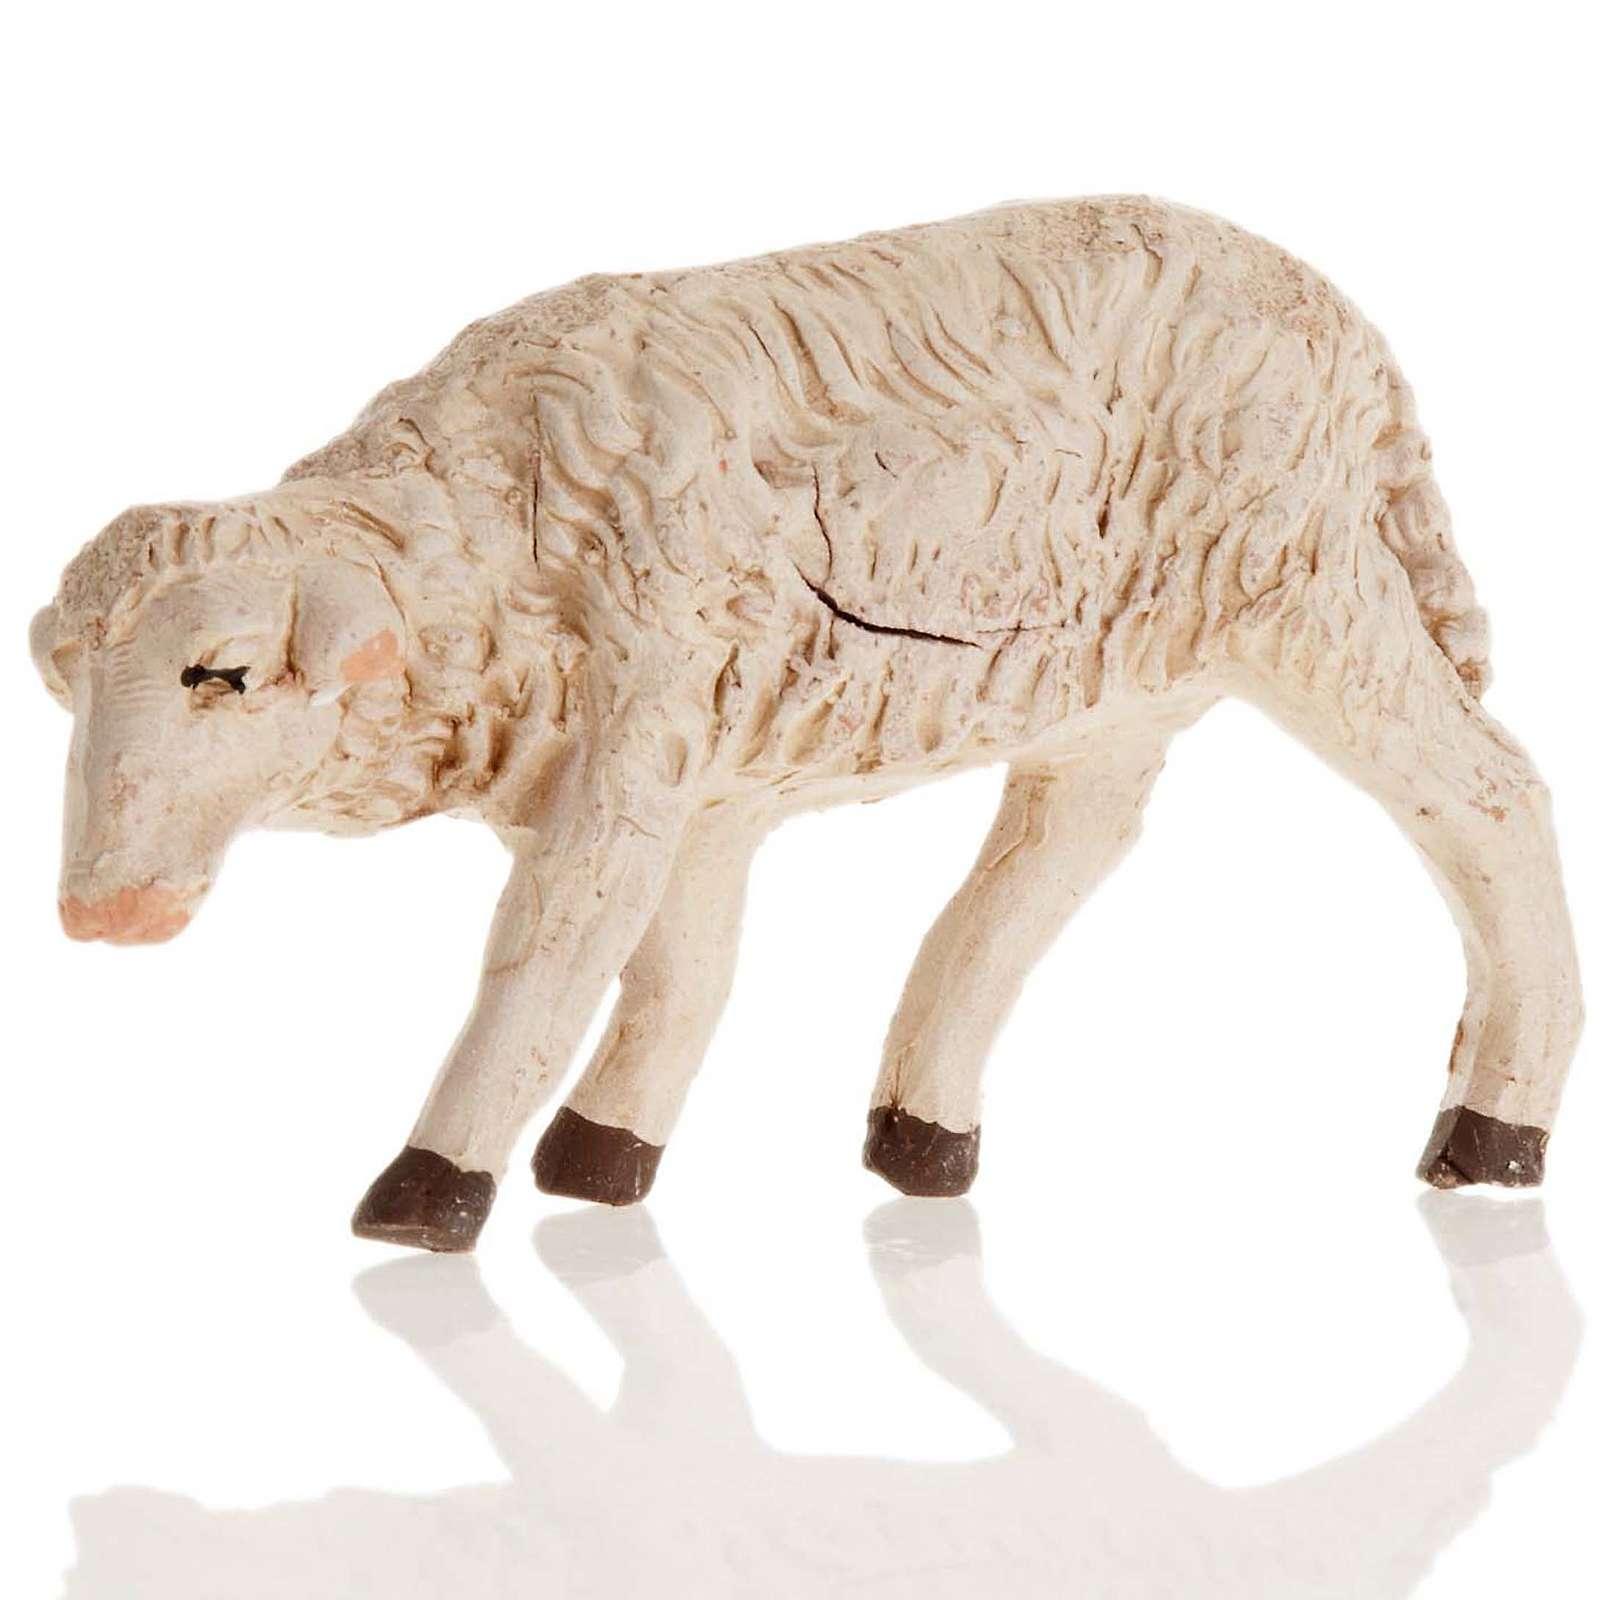 Neapolitan Nativity figurine, Sheep 14cm 4